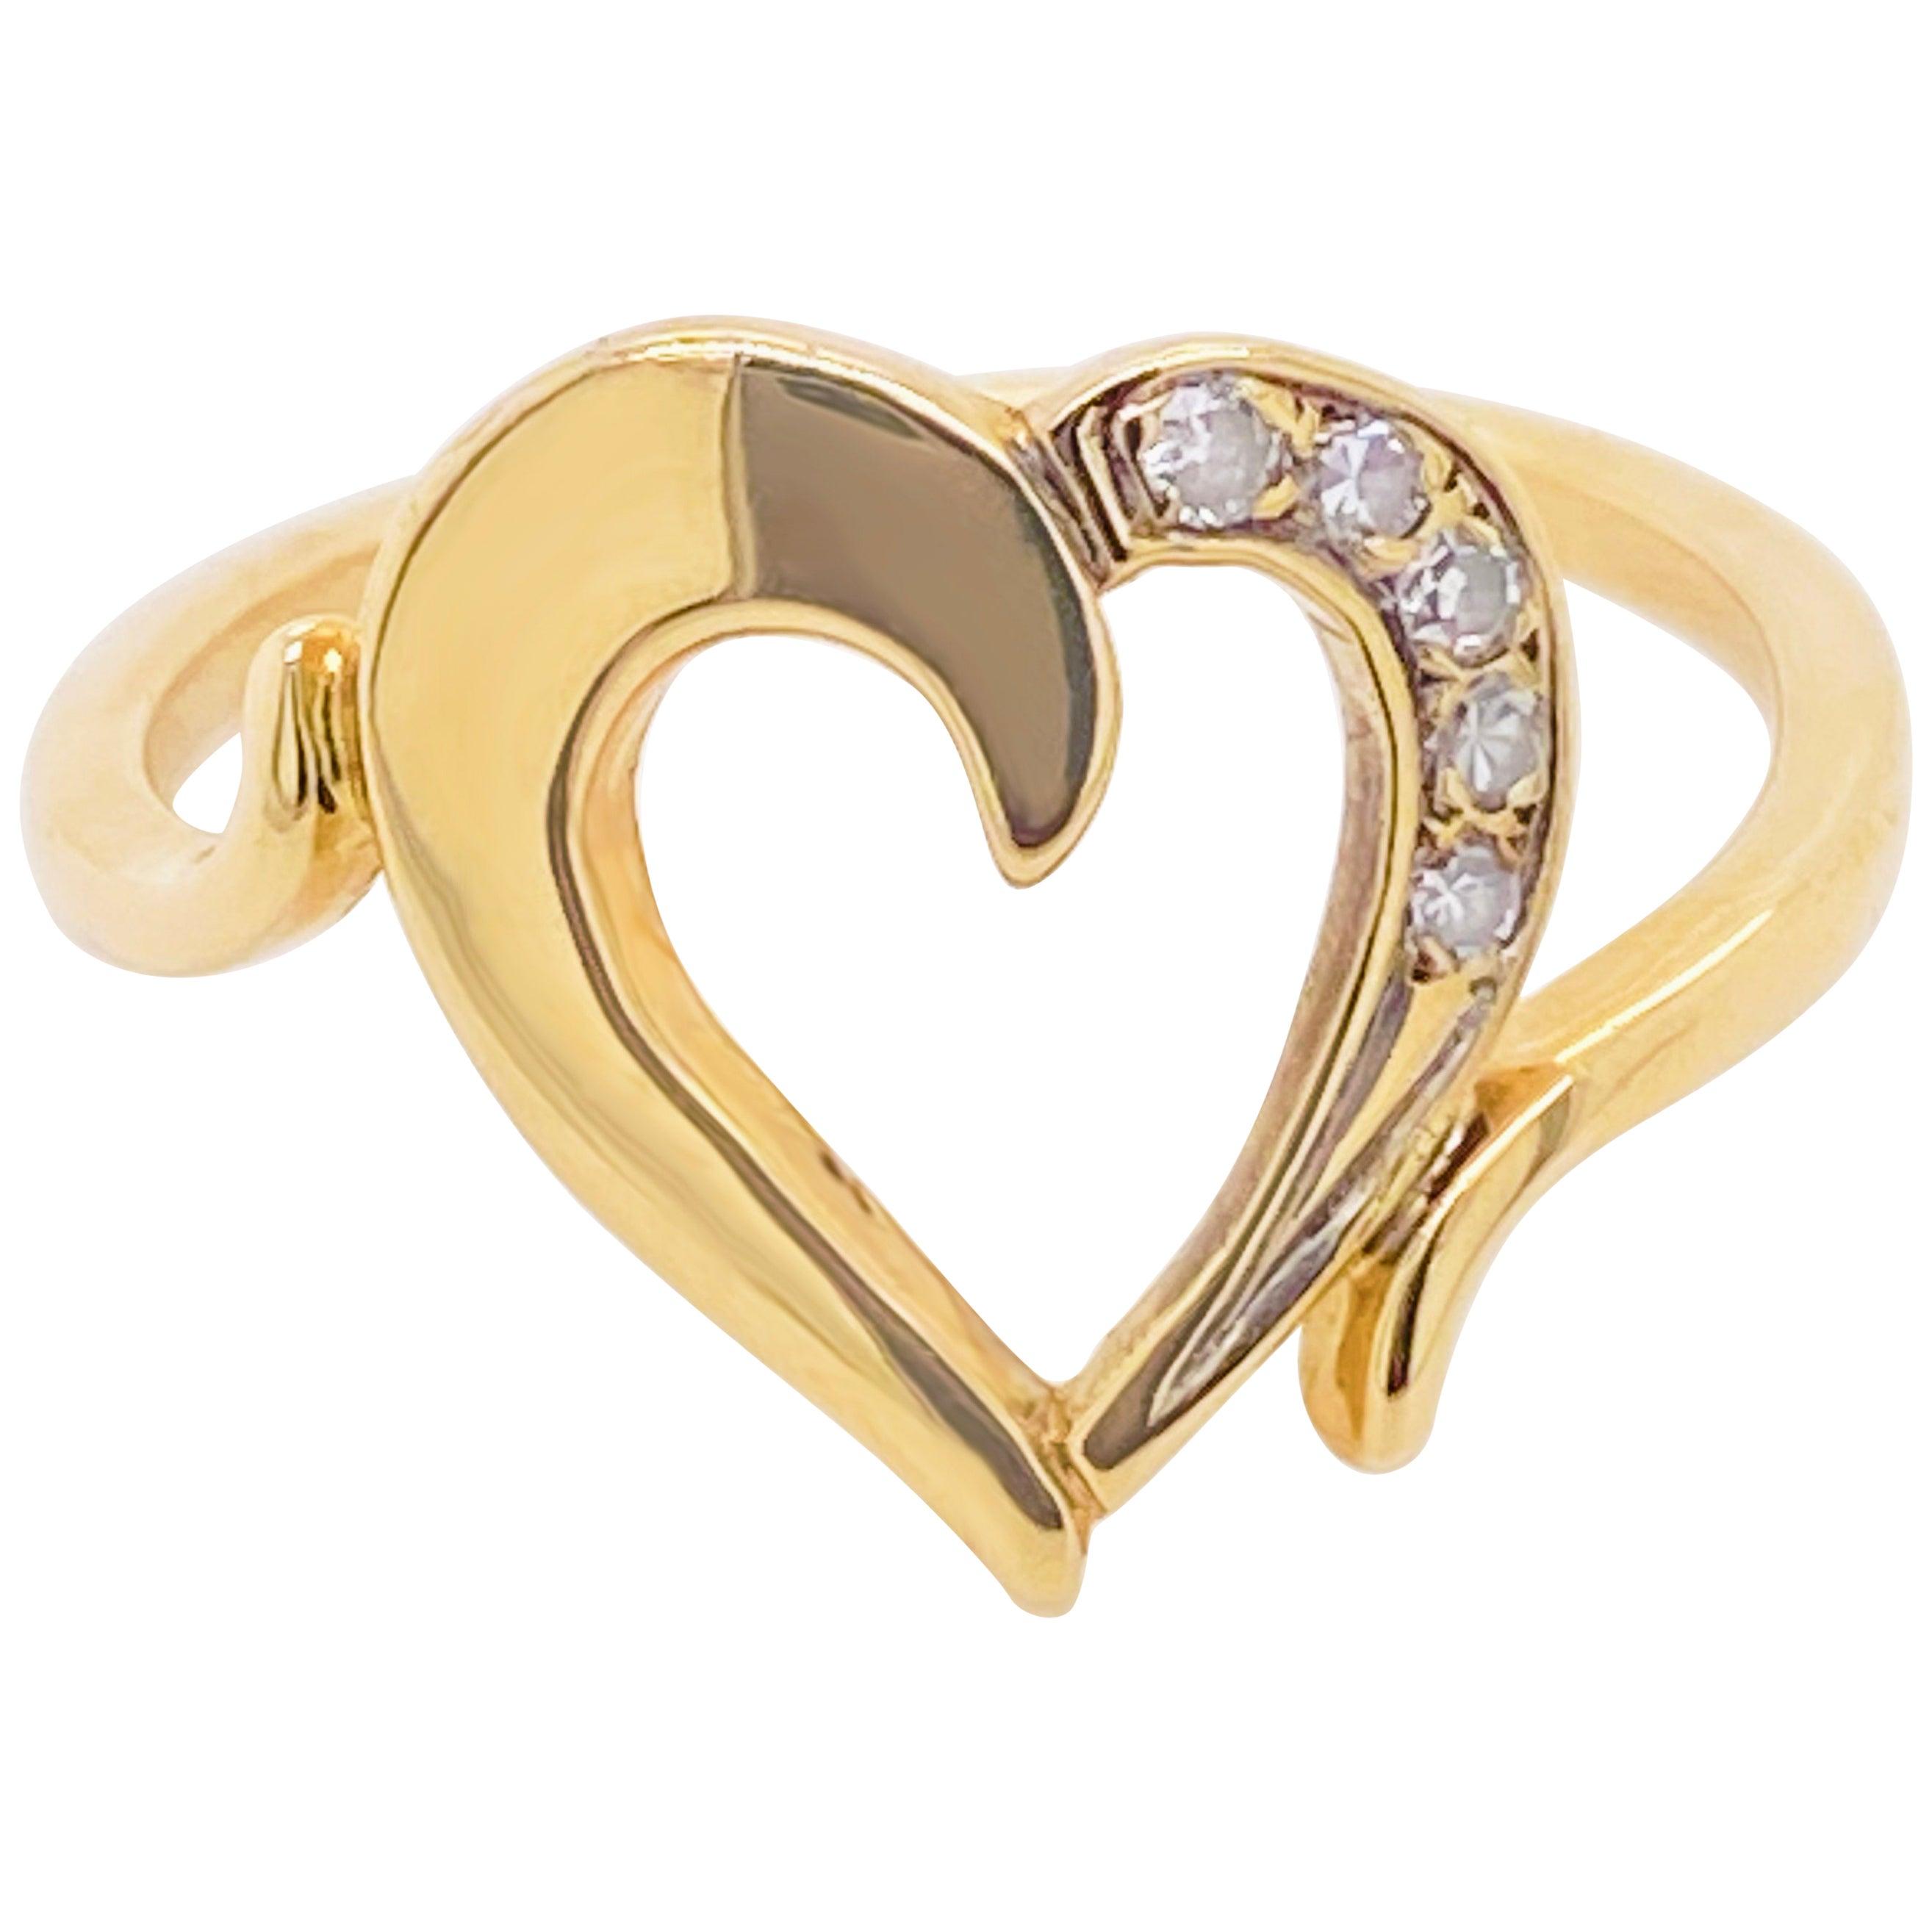 Diamond Heart Ring, Yellow Gold, Open Heart Ring, Promise Ring, Romantic Ring